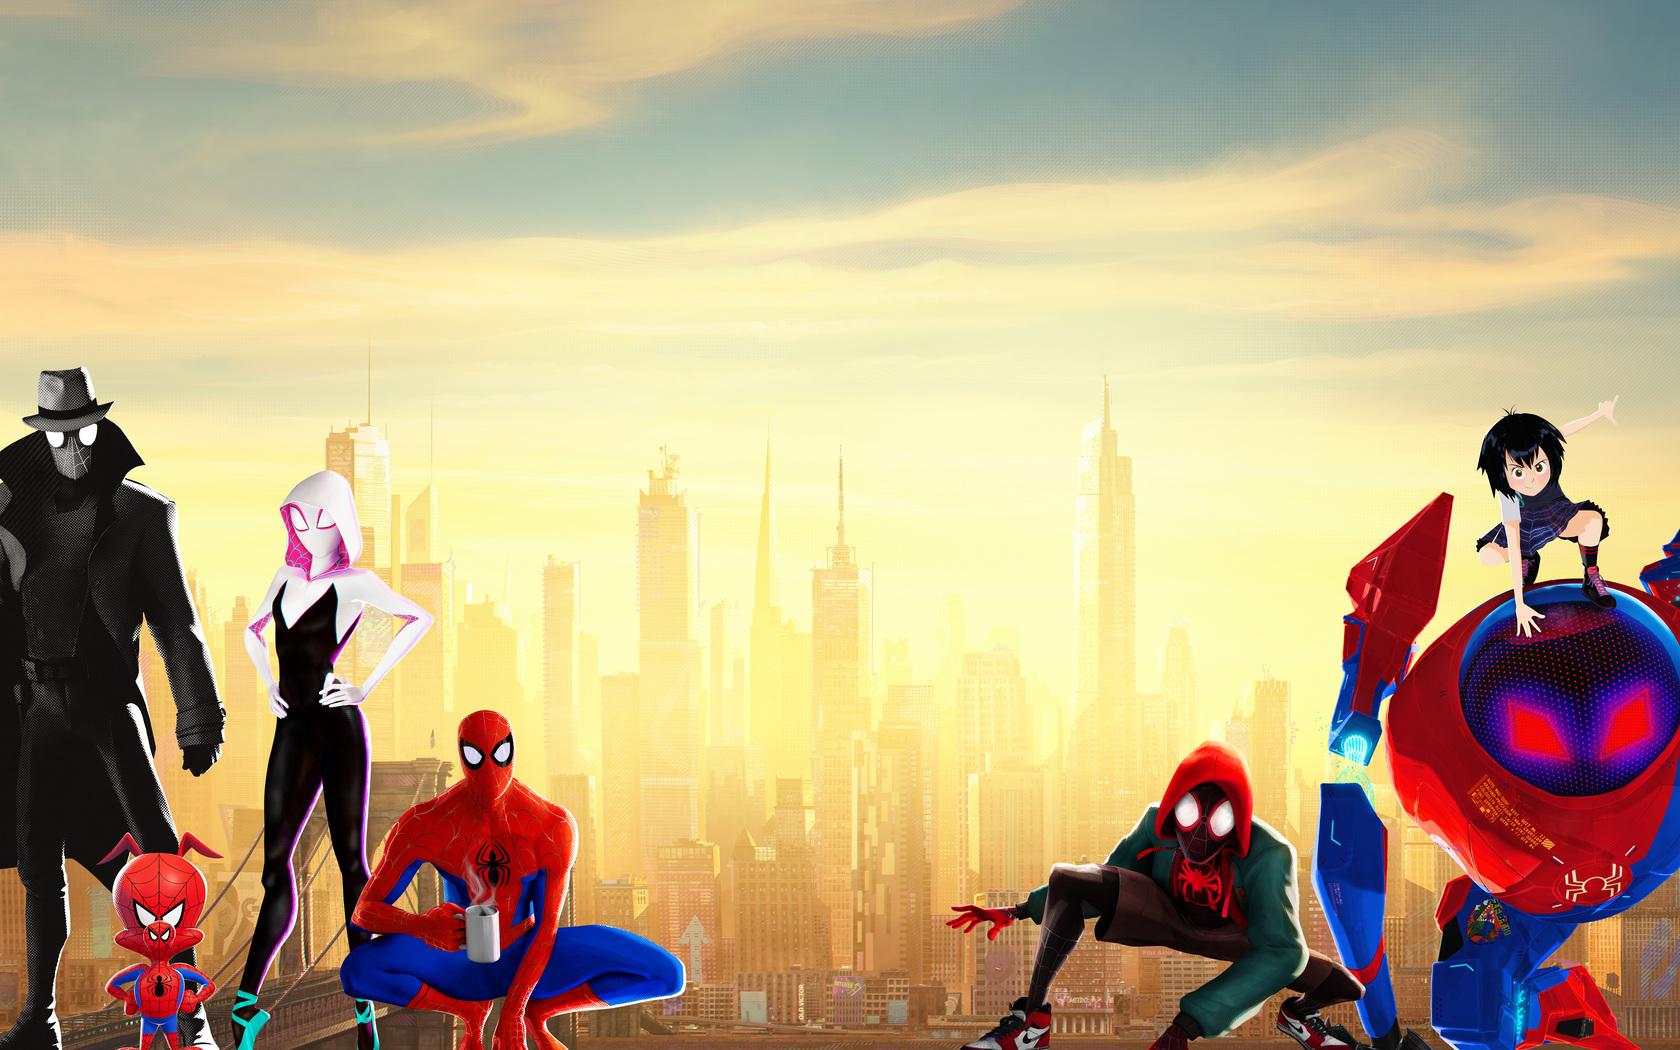 1680x1050 Spiderman Into The Spider Verse 15k 1680x1050 ...